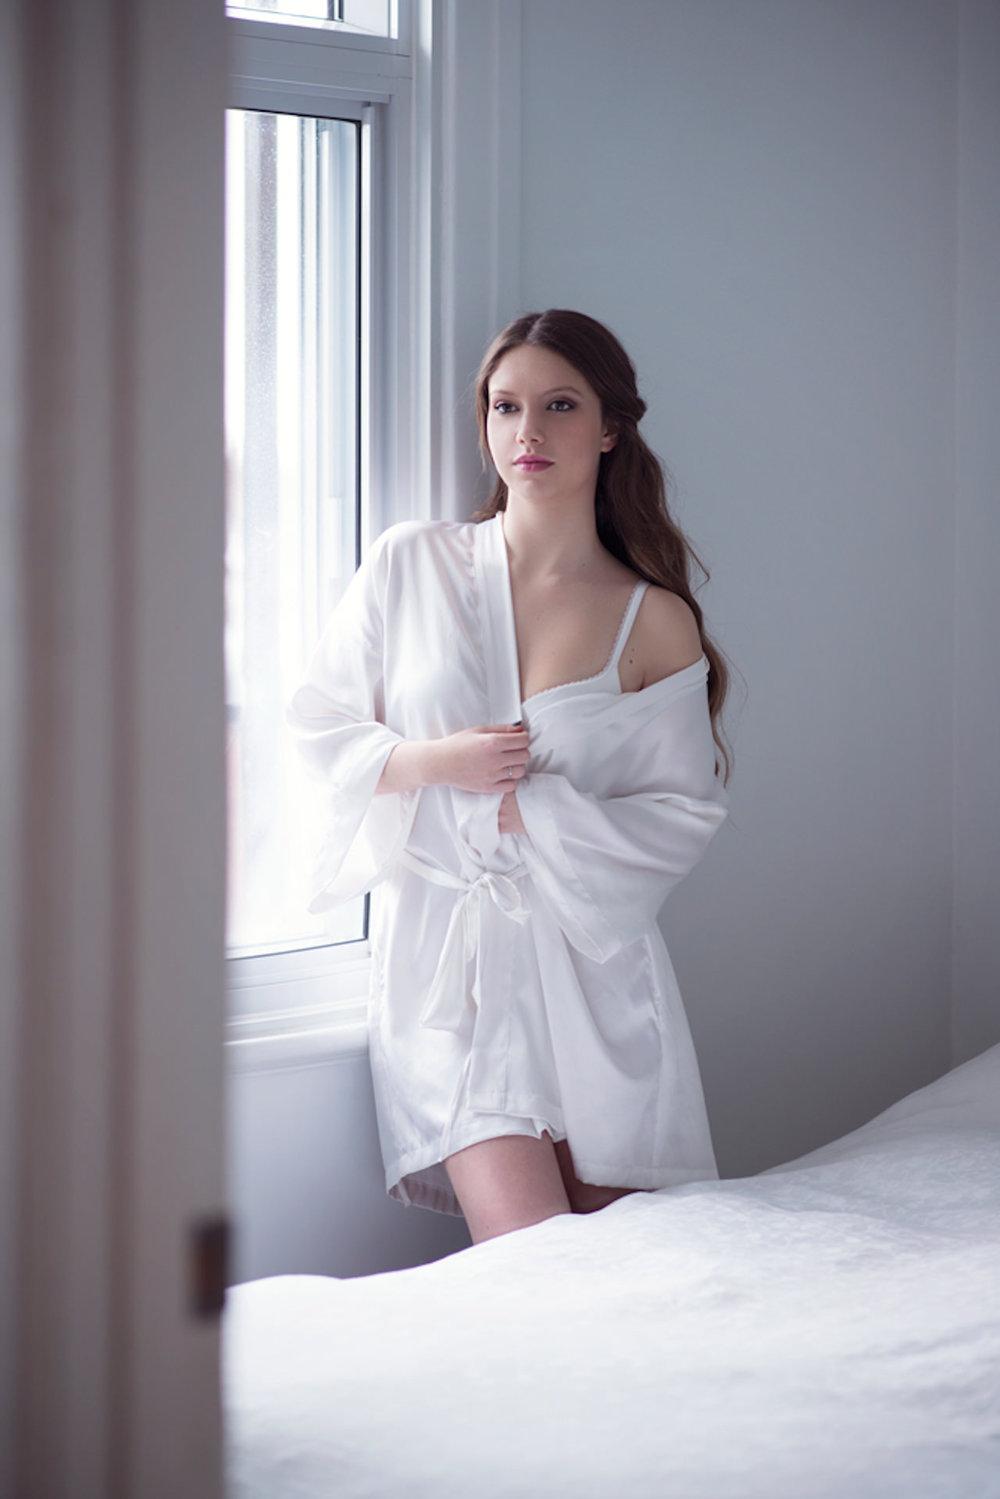 Marie-Eve_morin_02_mini.jpg